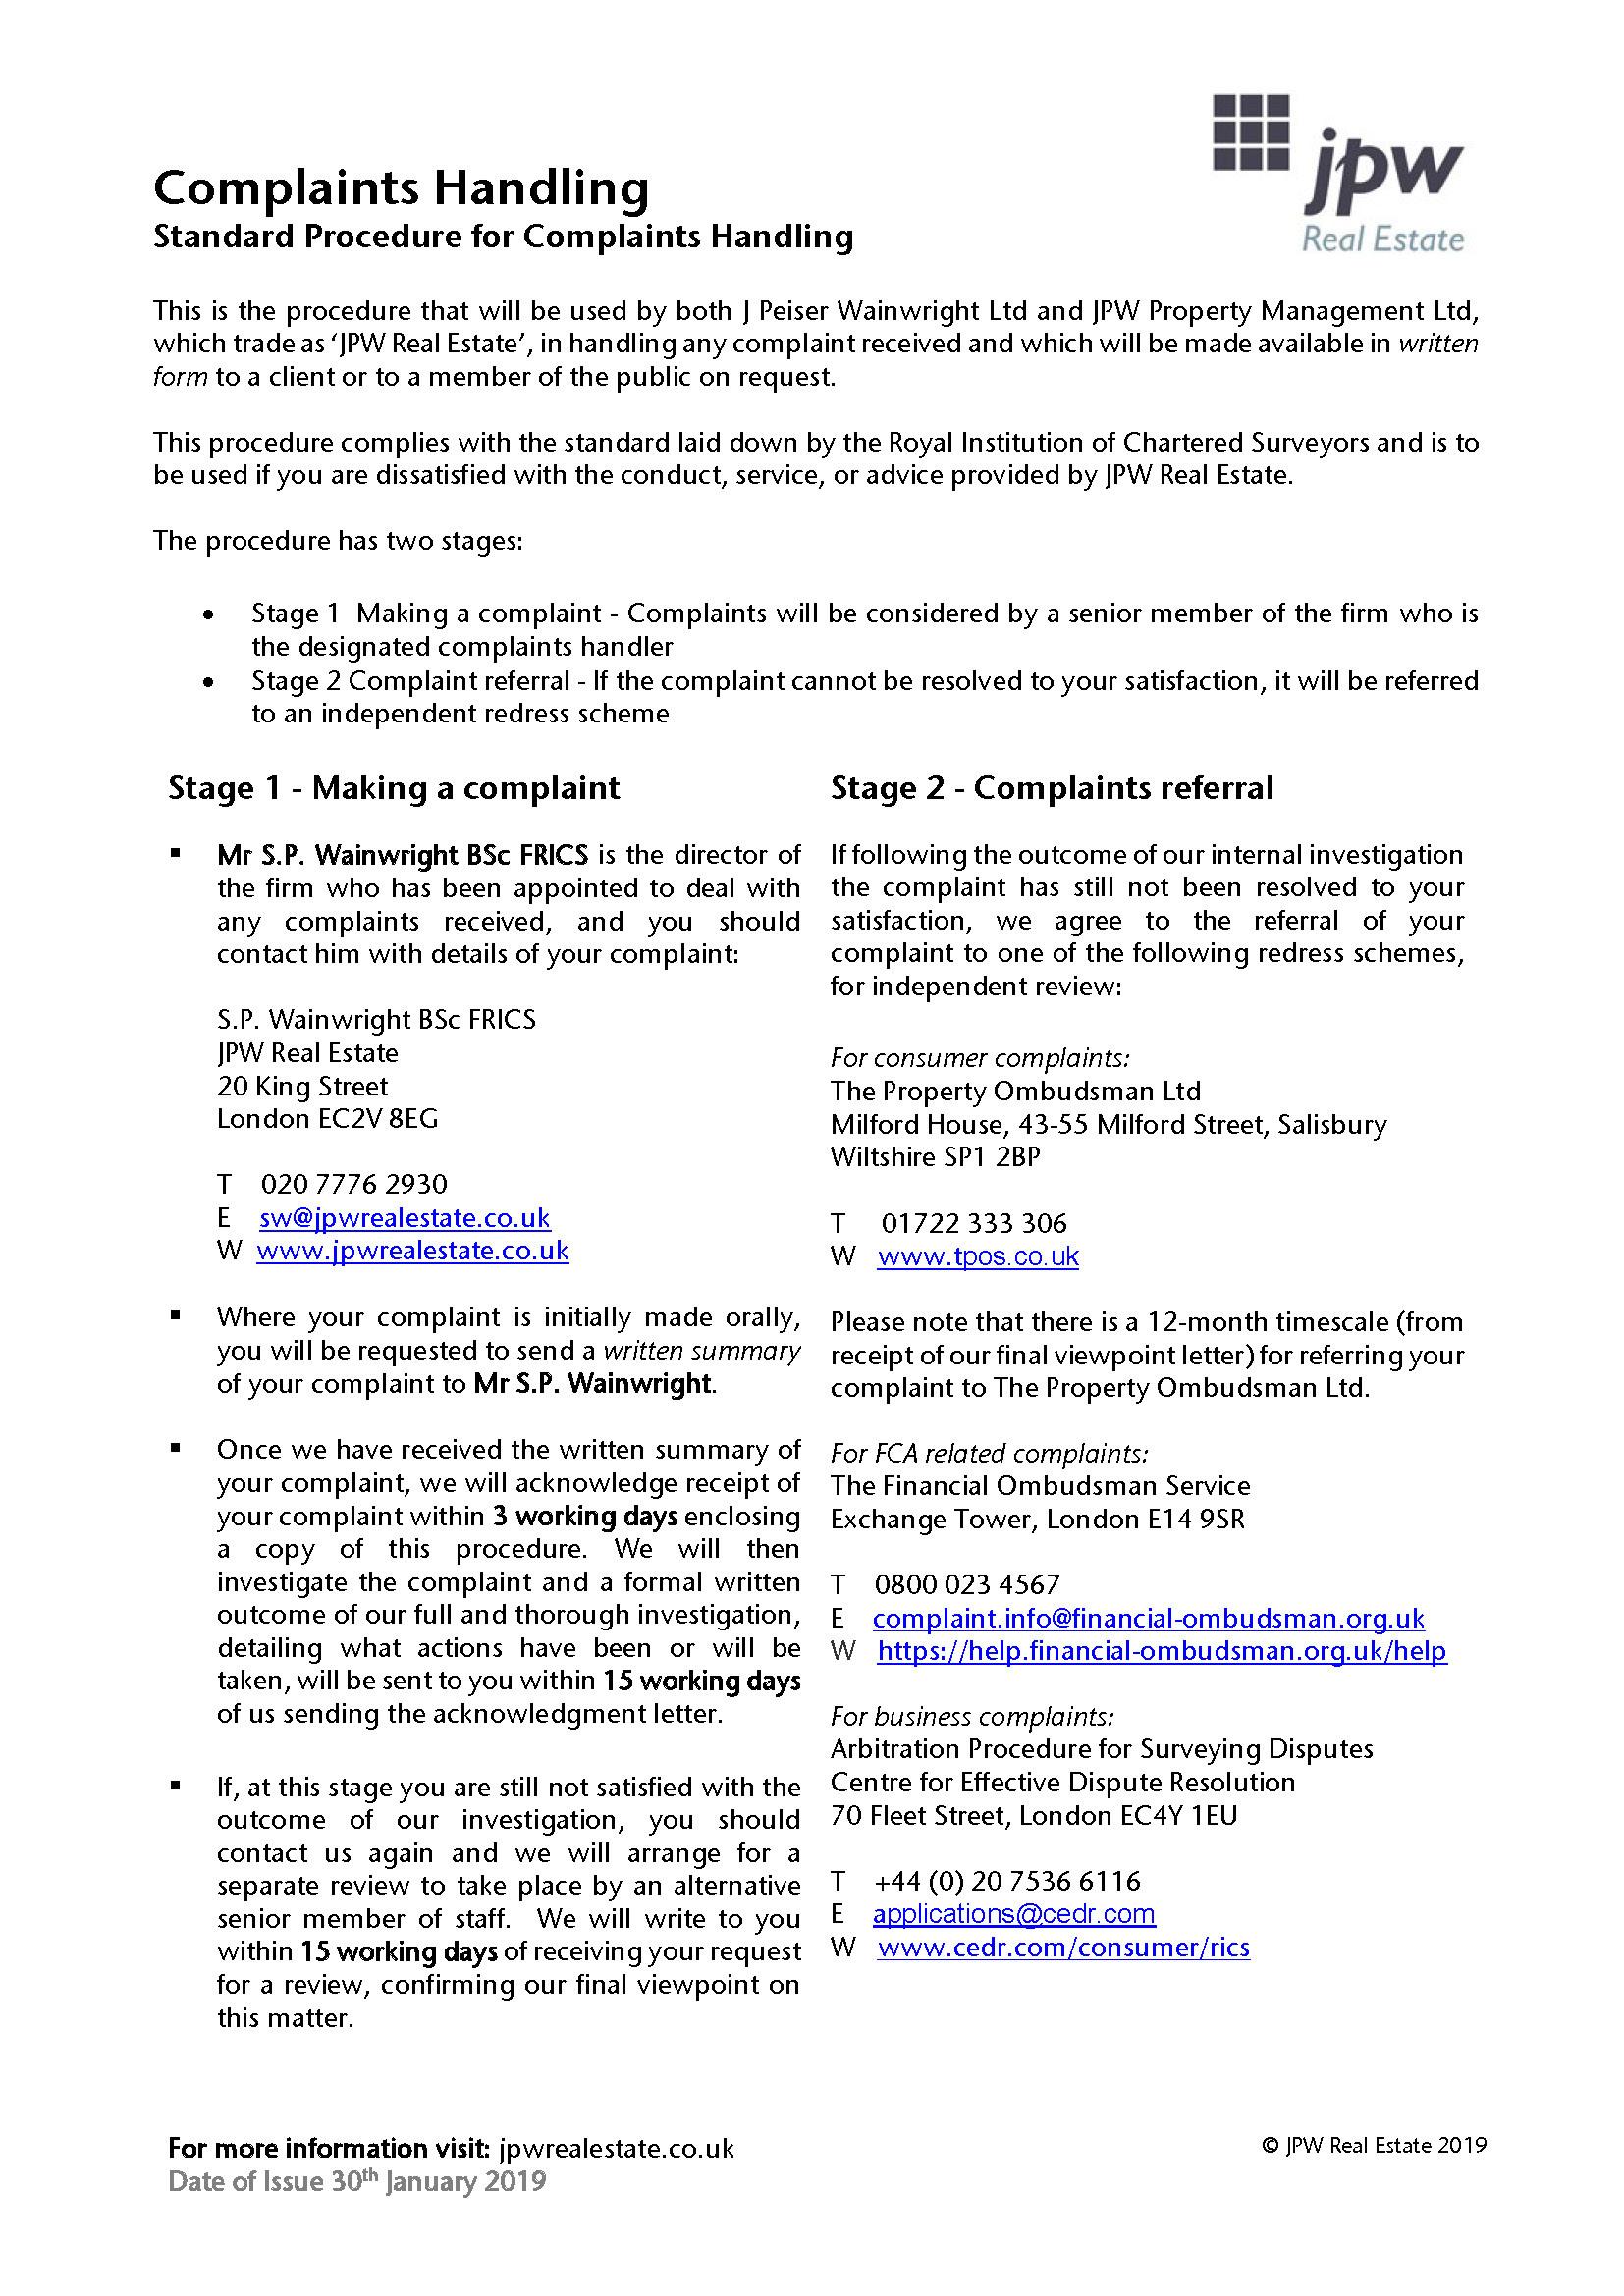 Jpw Real Estate Complaints Procedure 01 2019